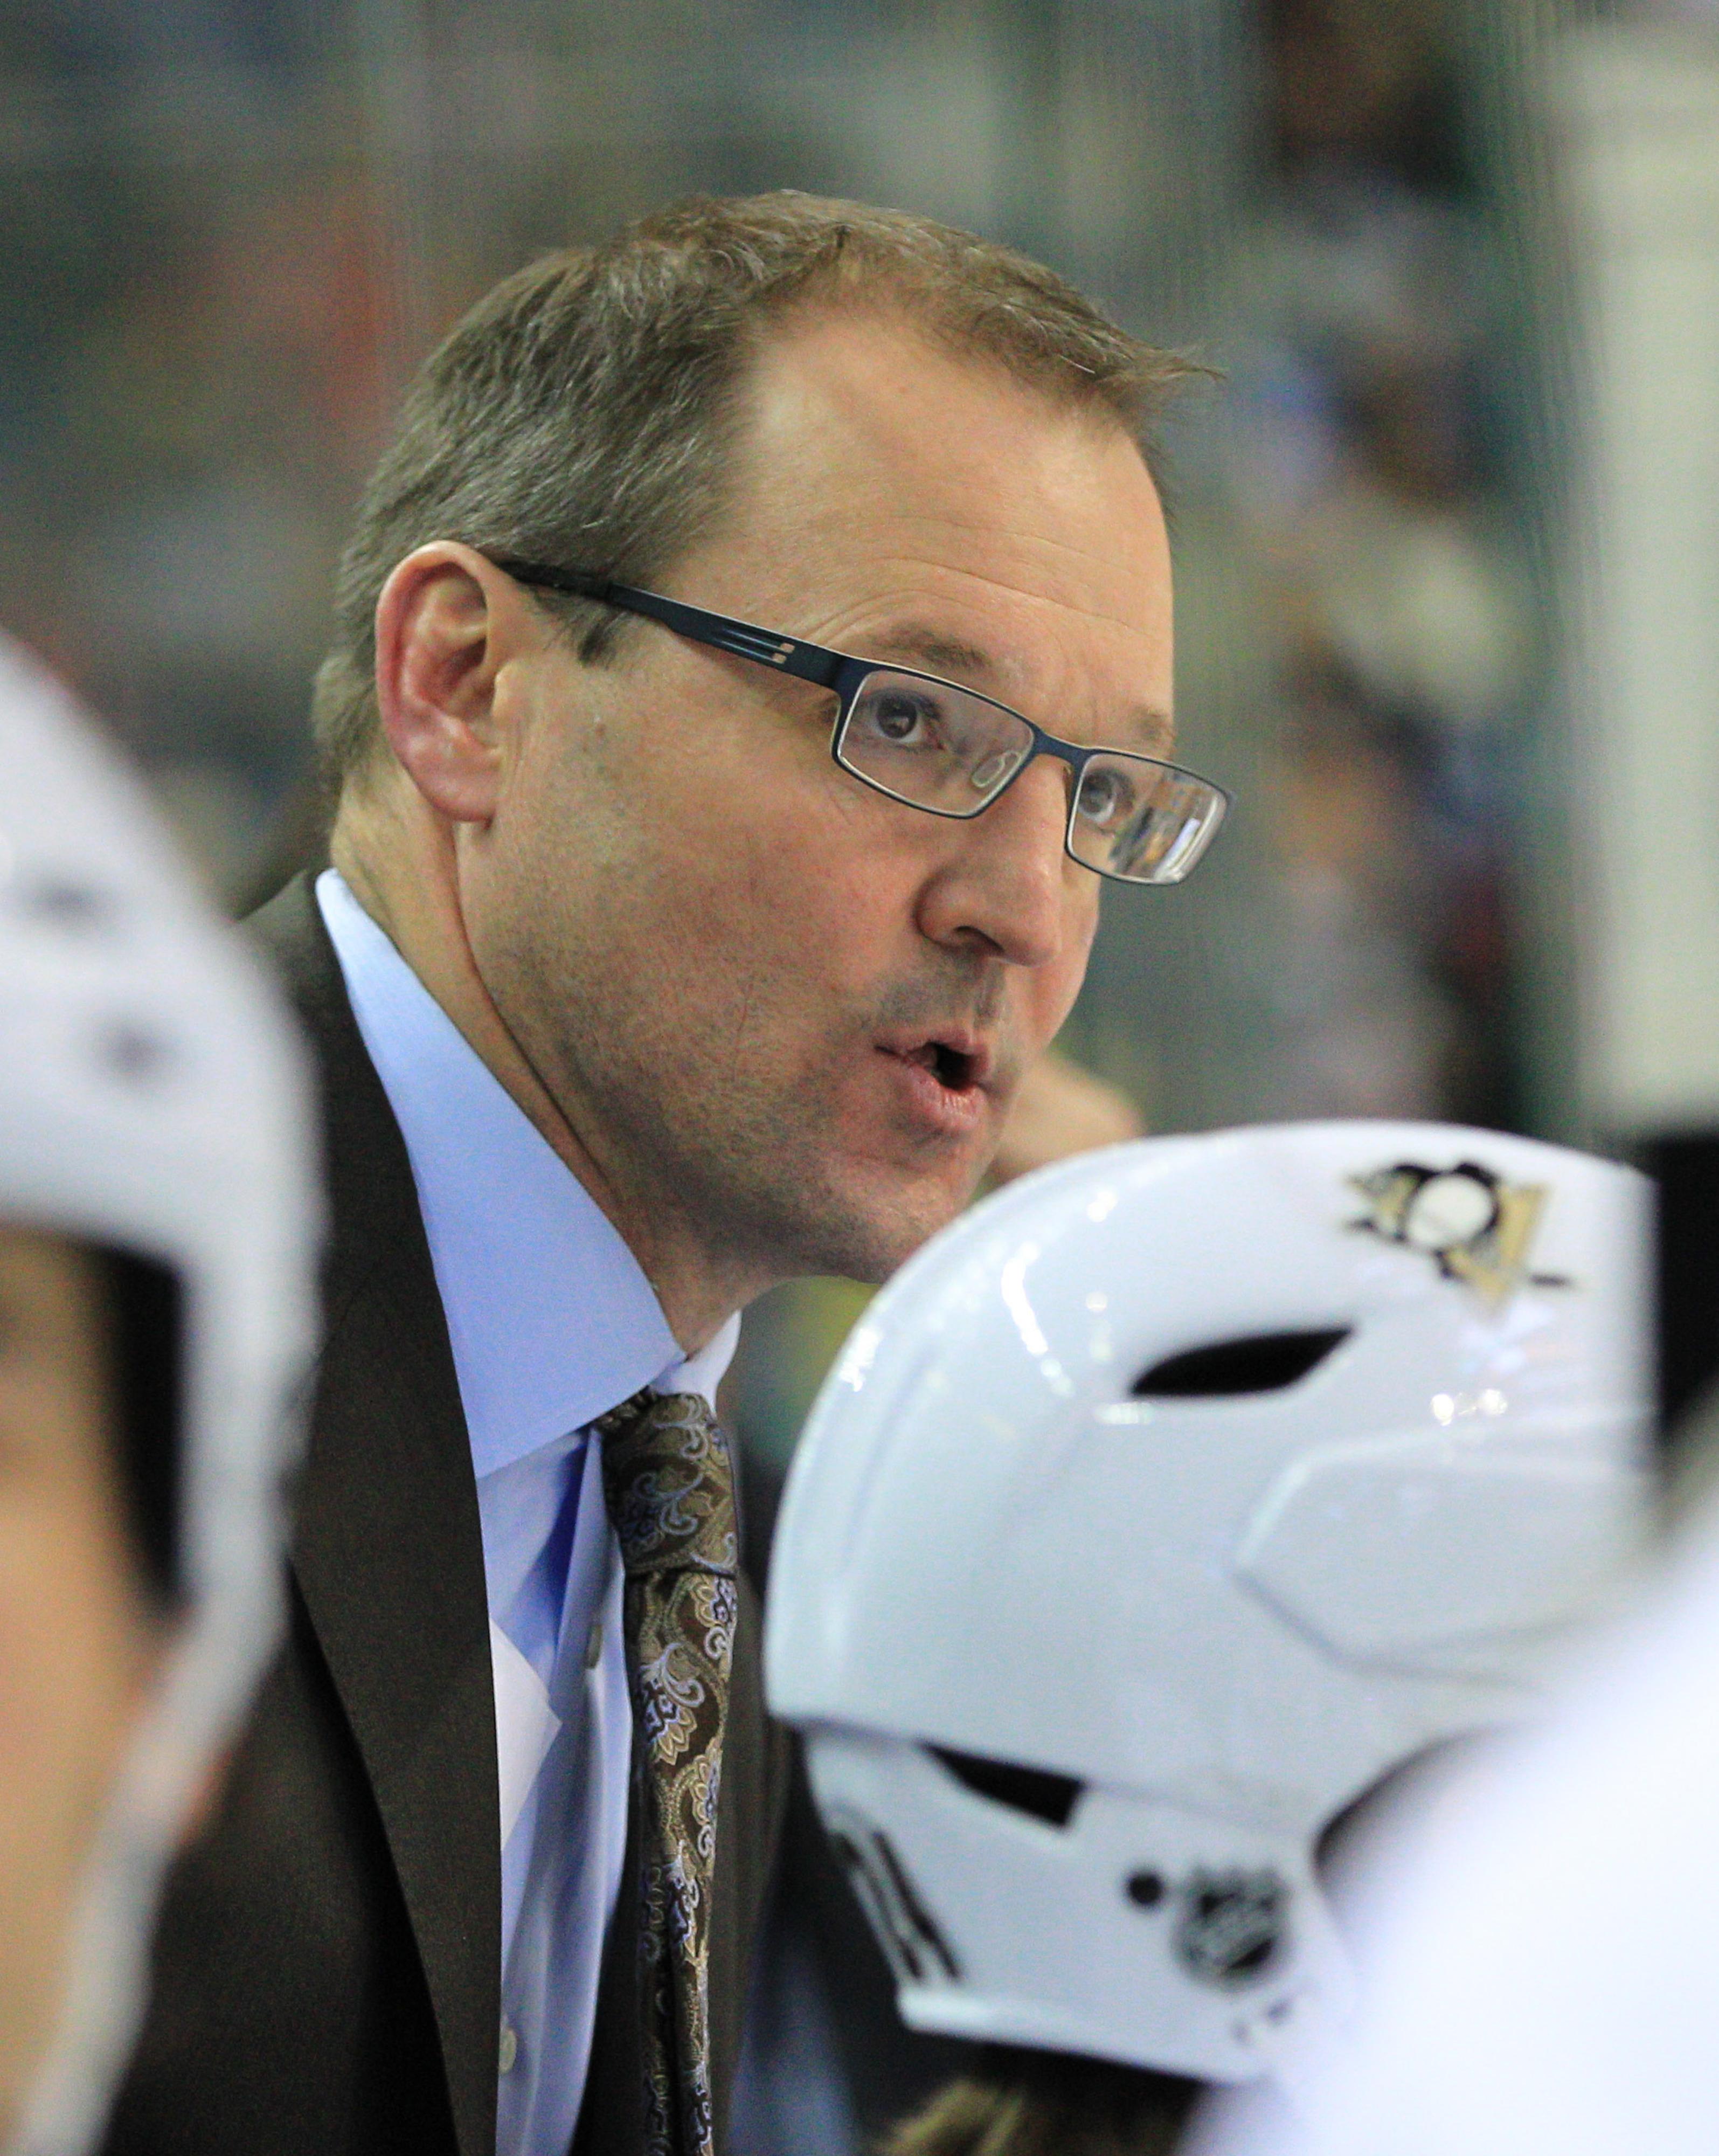 Sochi Olympics 2014: Dan Bylsma to coach Team USA, according to report